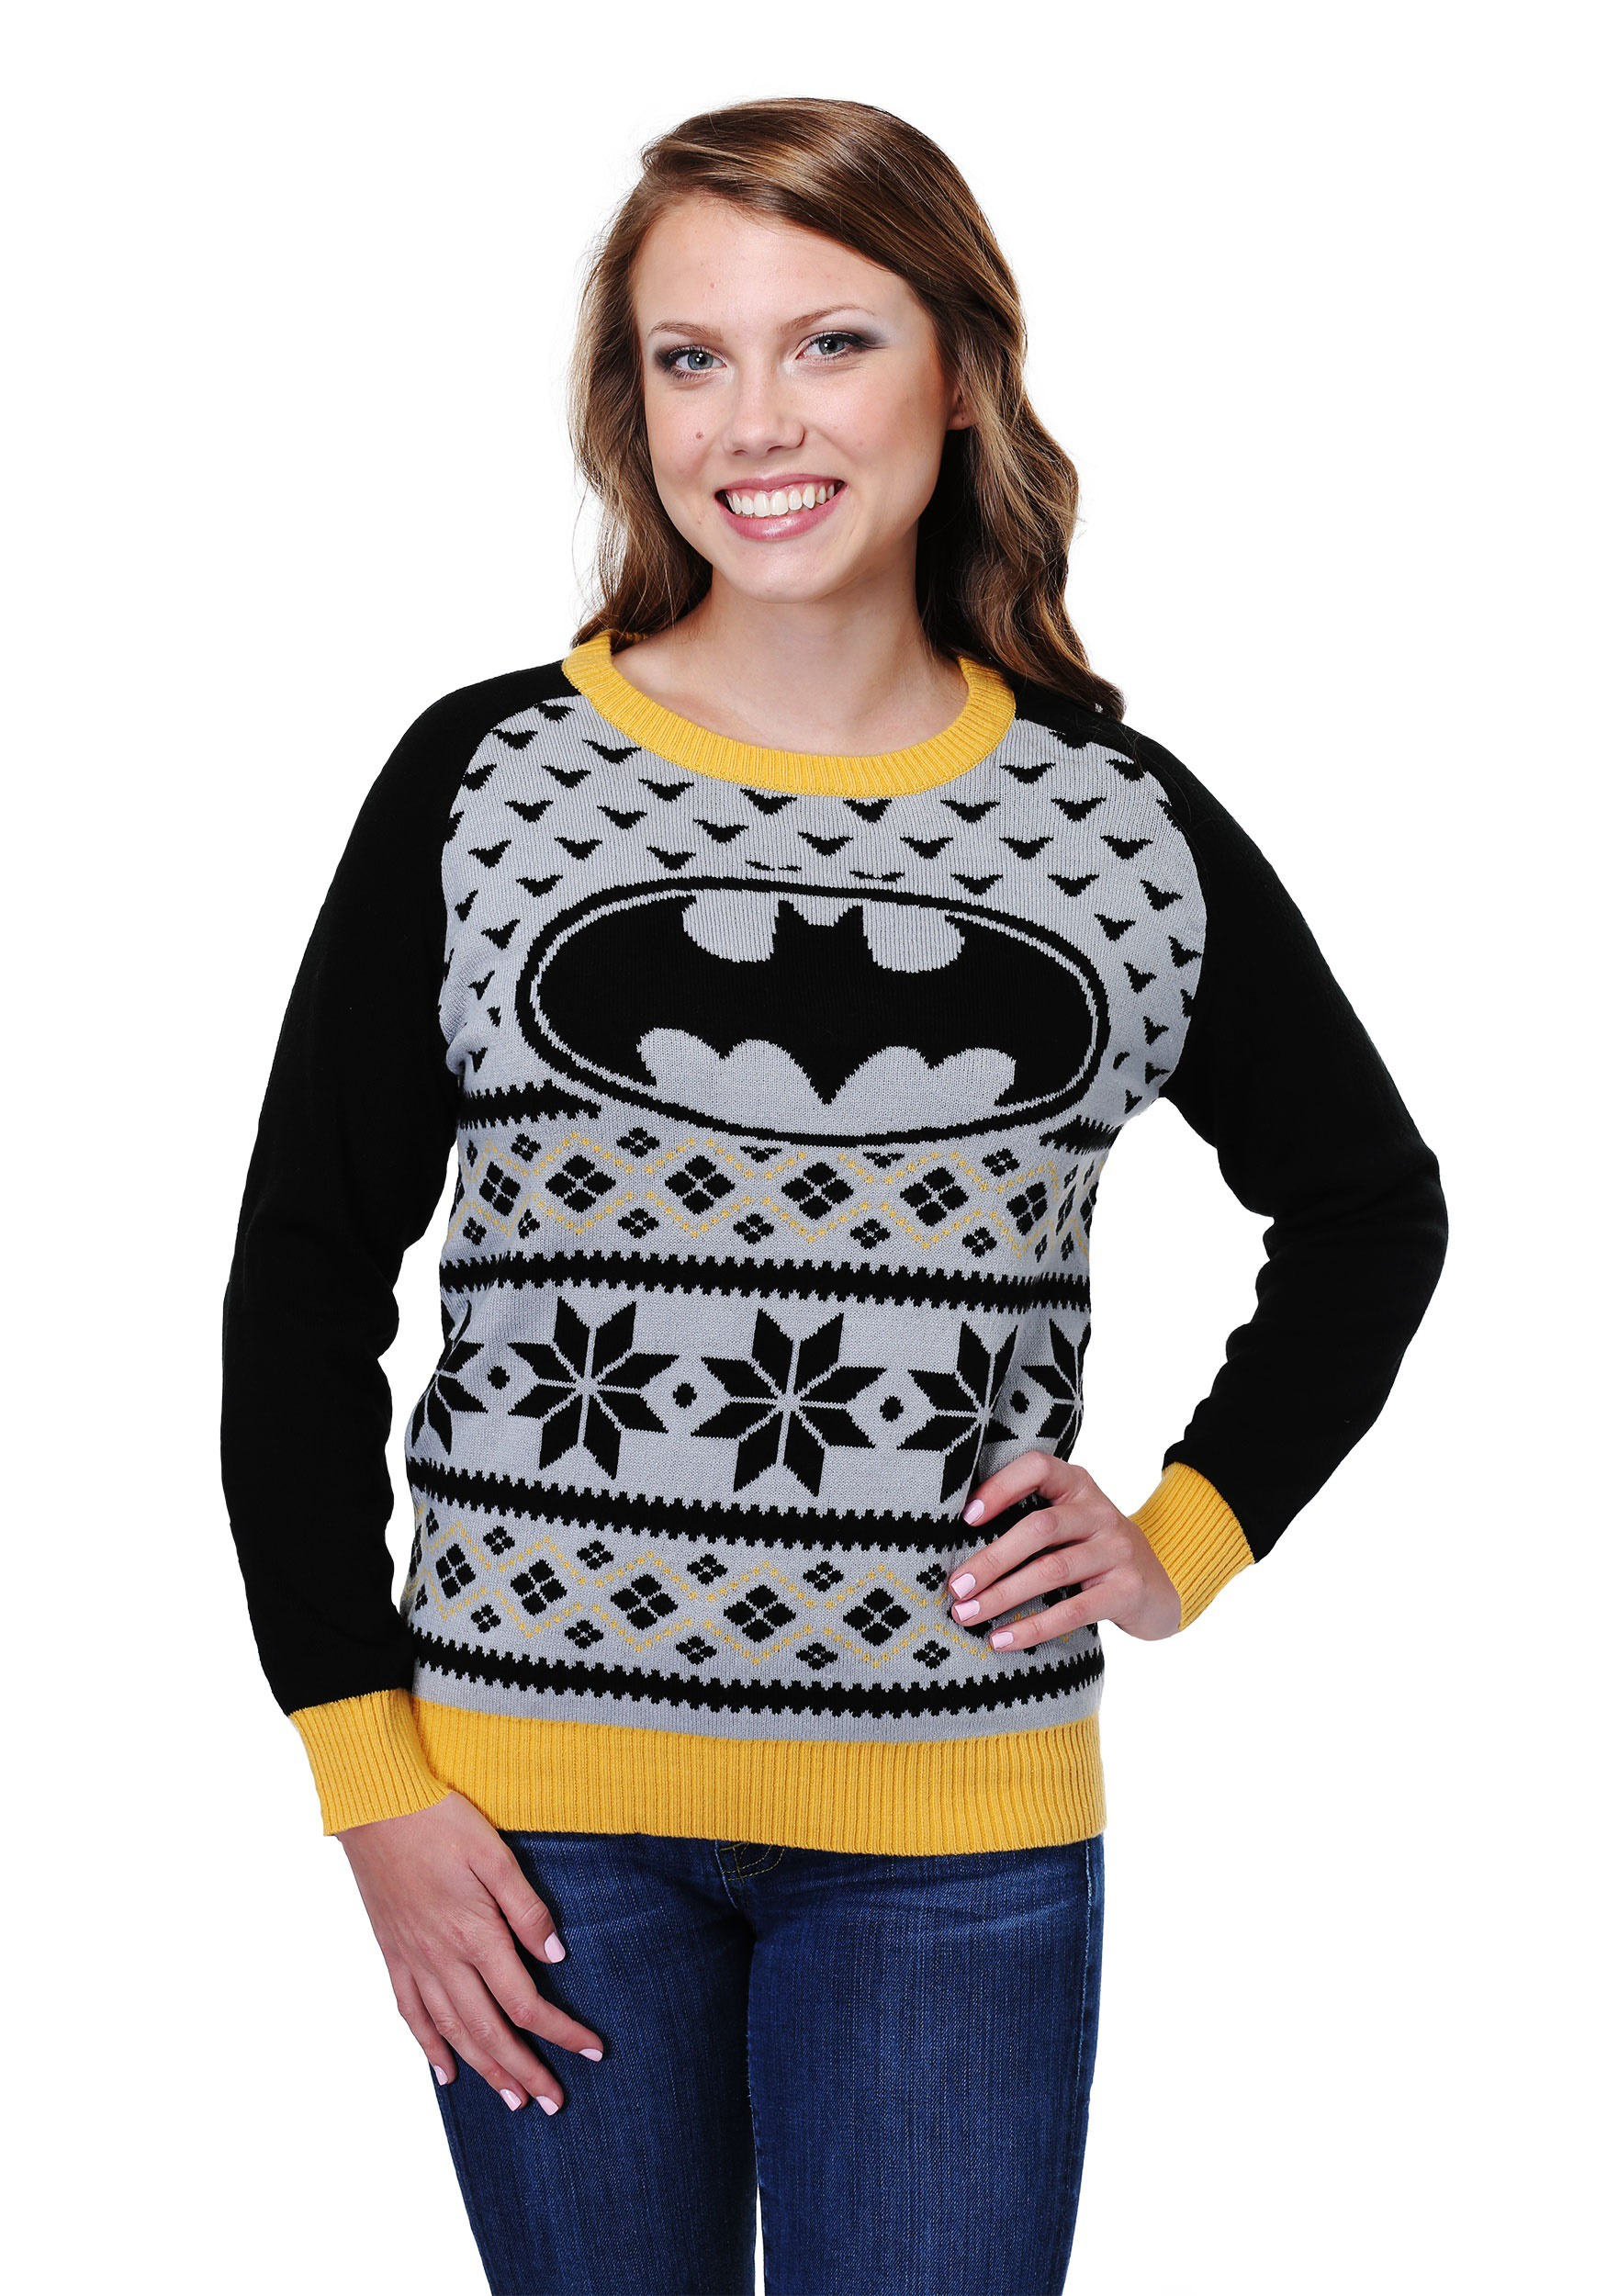 Batman Ugly Christmas Sweater for Women